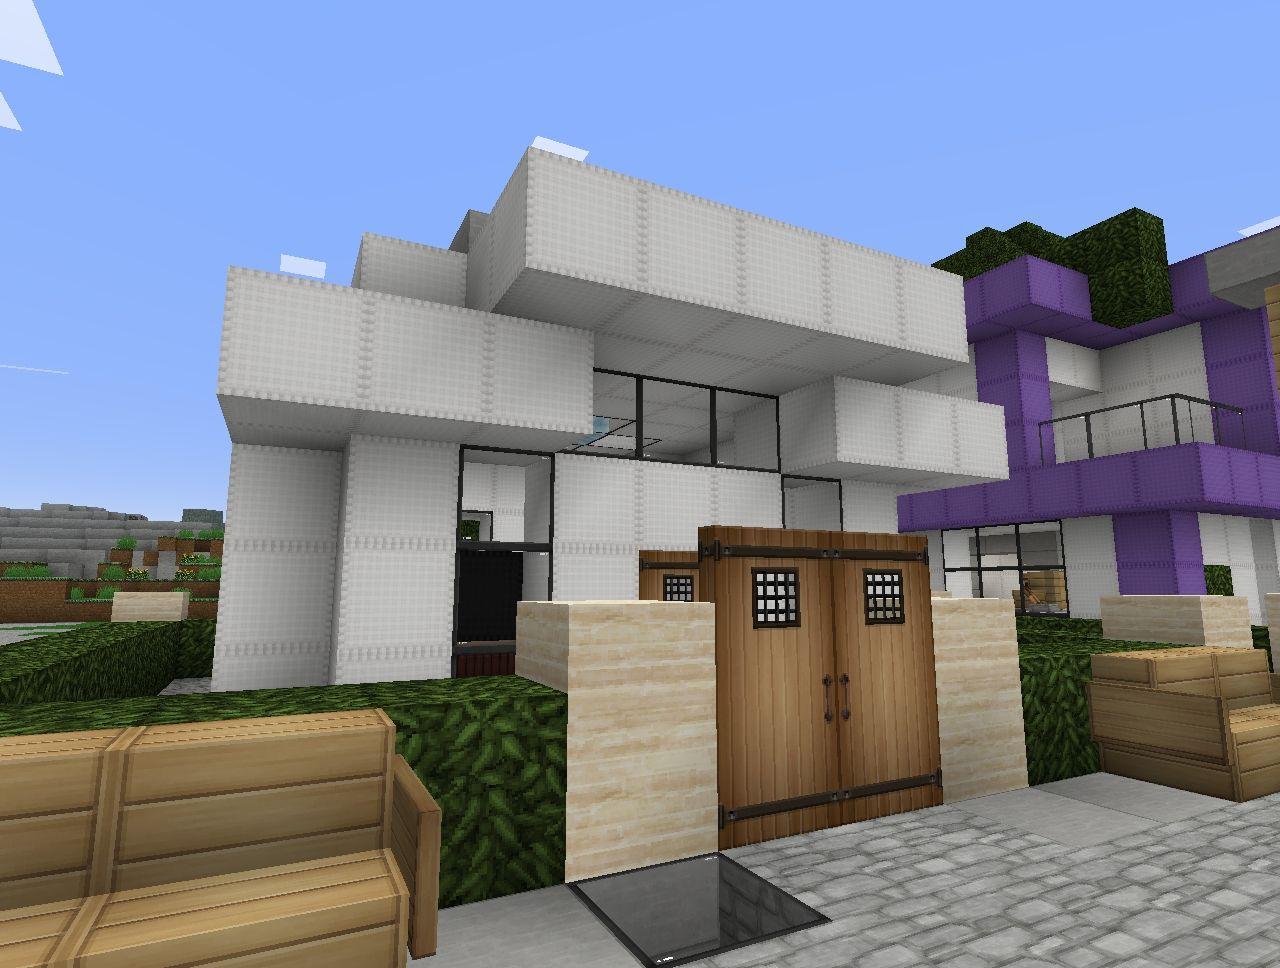 Modern house project v0 2 by ints12 minecraft project for Modern house projects